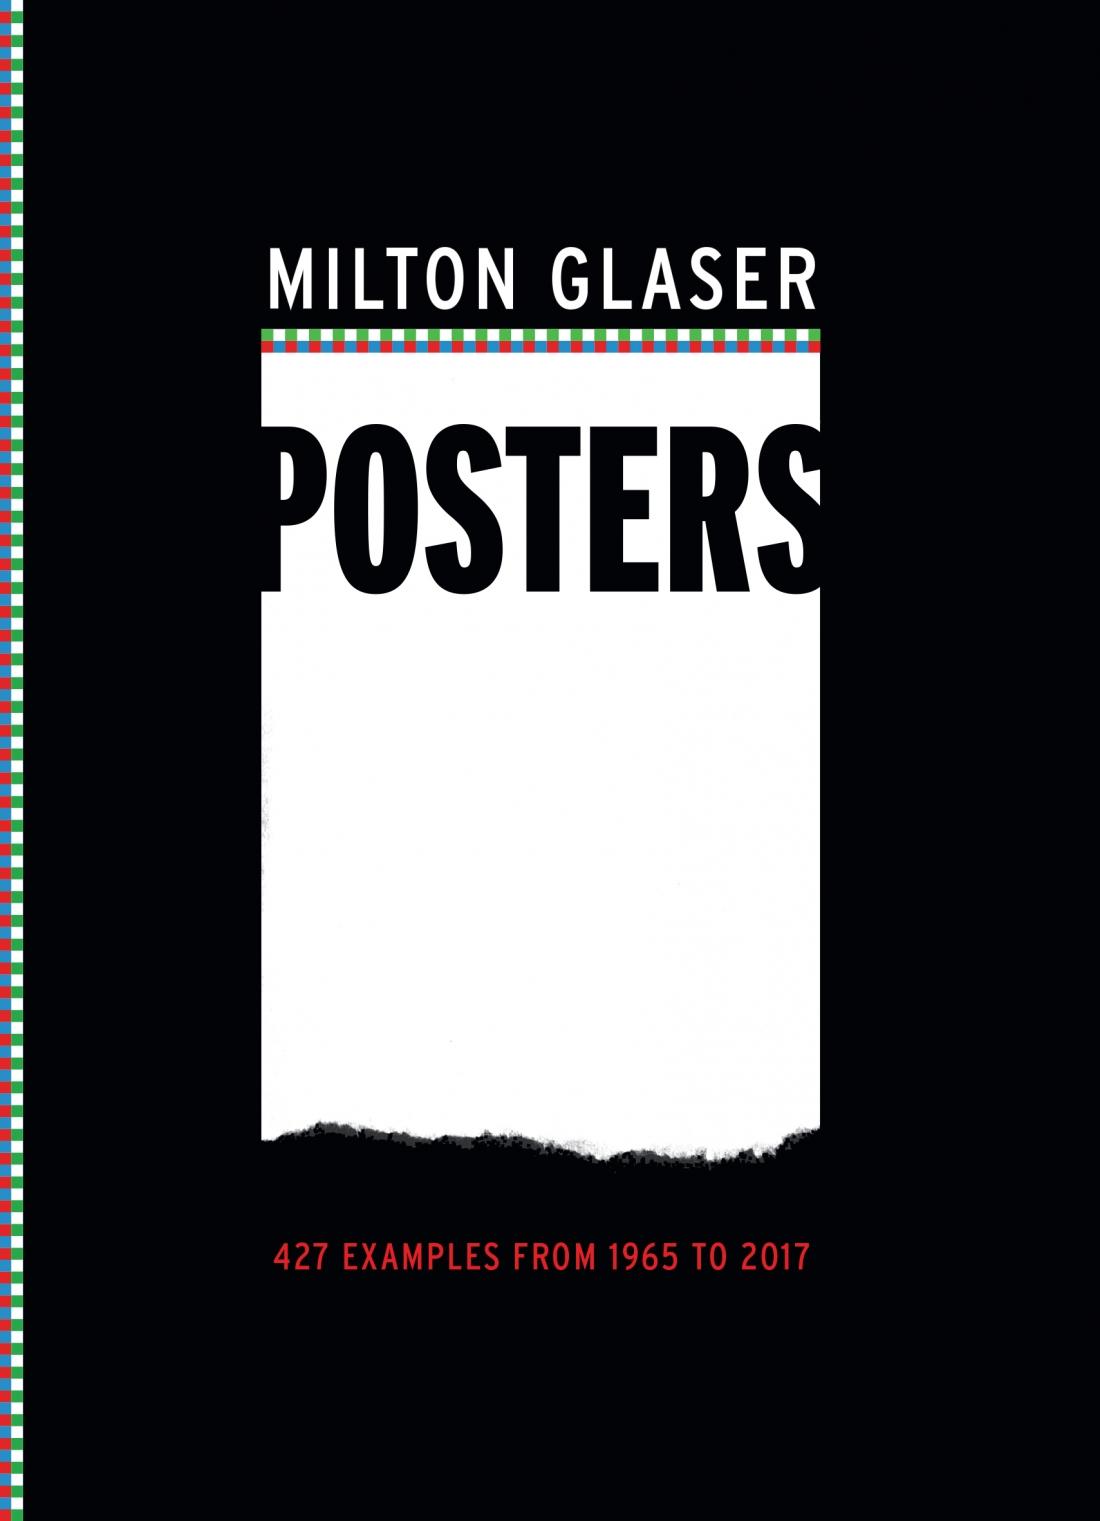 © 2018 Milton Glaser